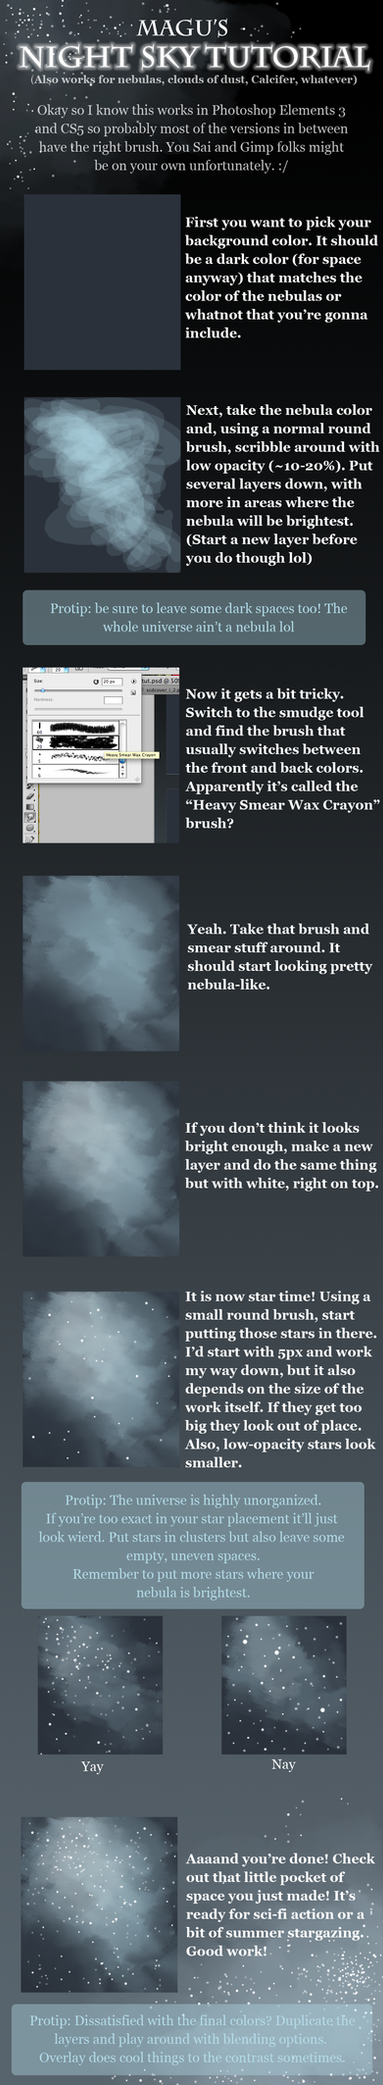 Night Sky Tutorial by Quilofire